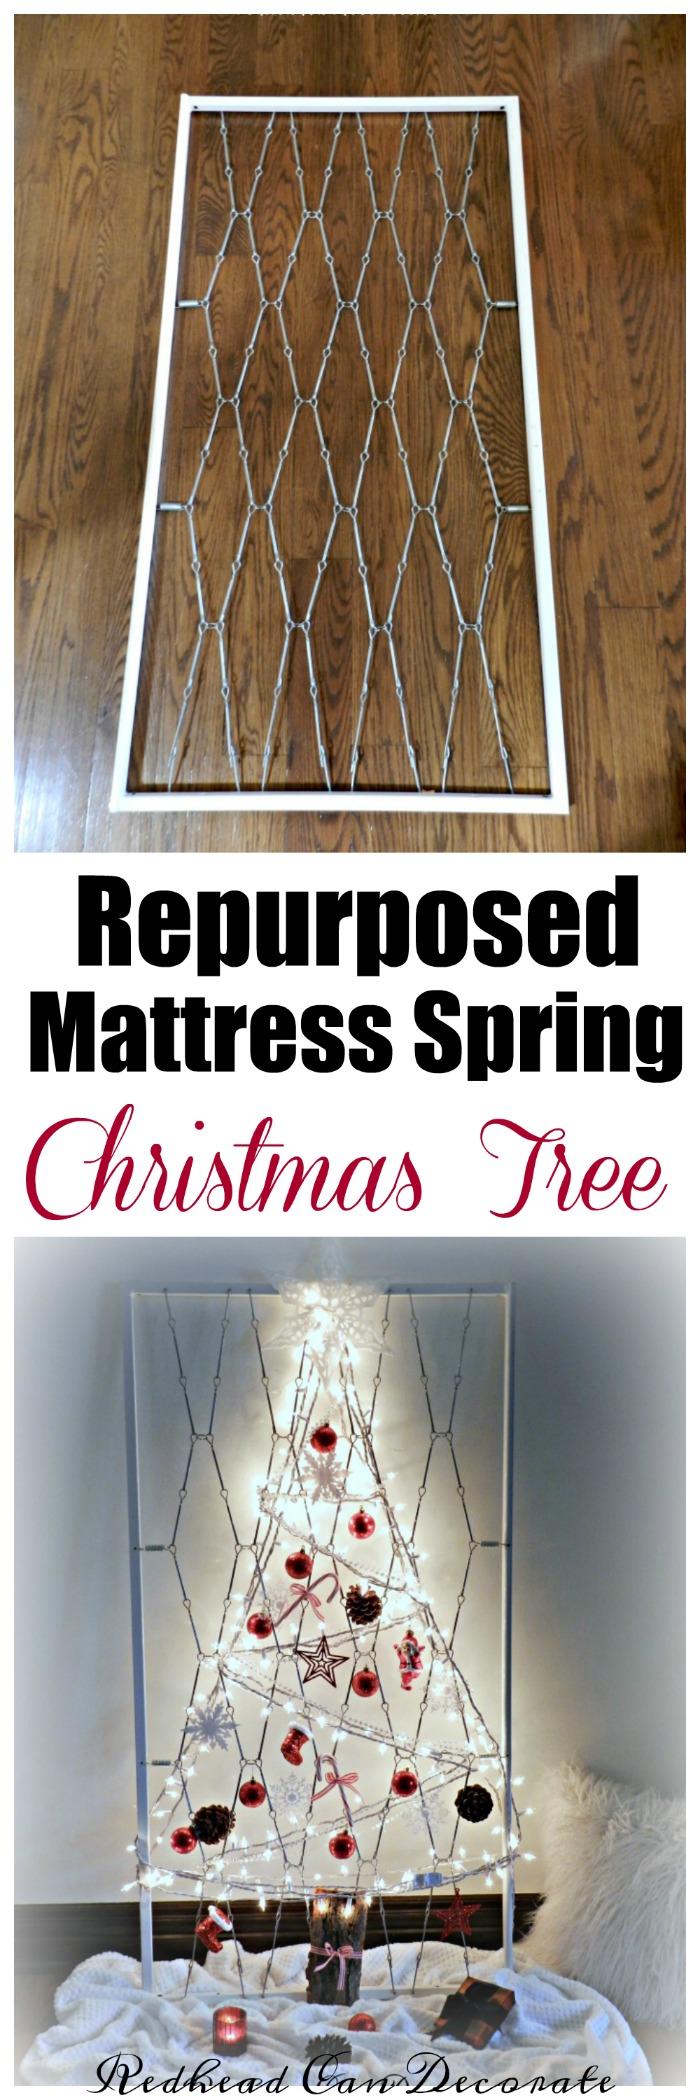 repurposed-crib-mattress-spring-christmas-tree